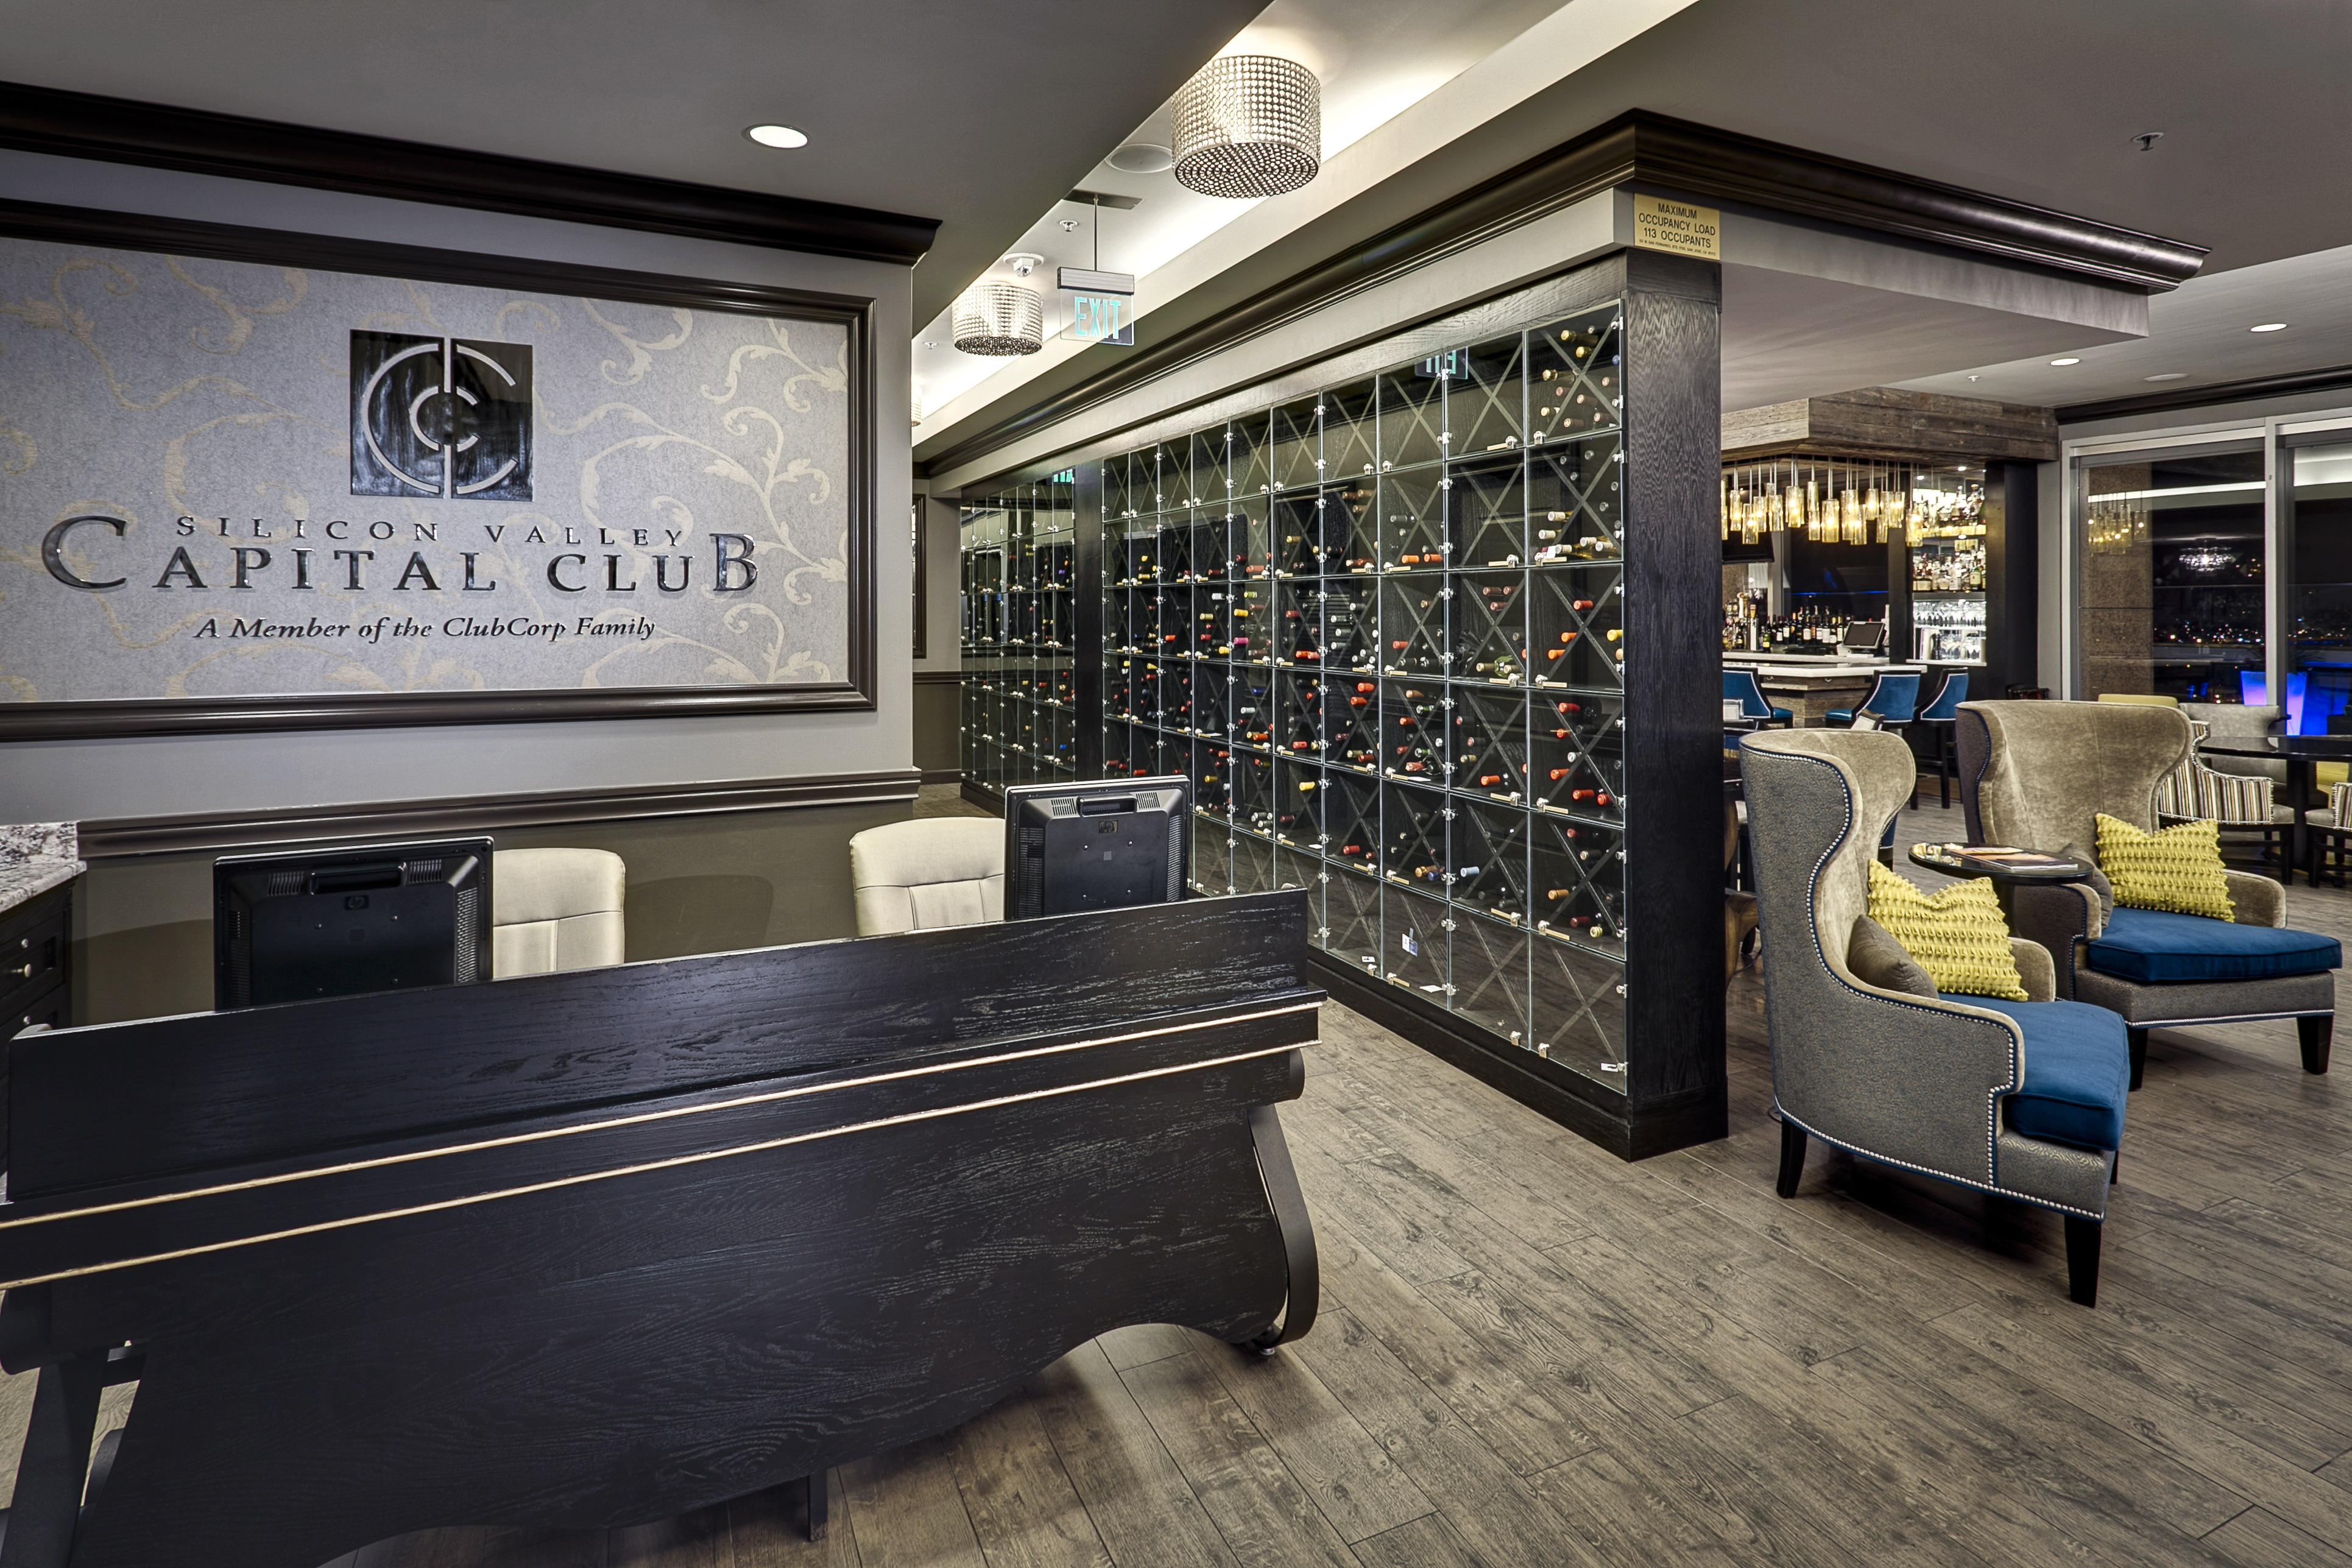 Silicon Valley Capital Club Delawie